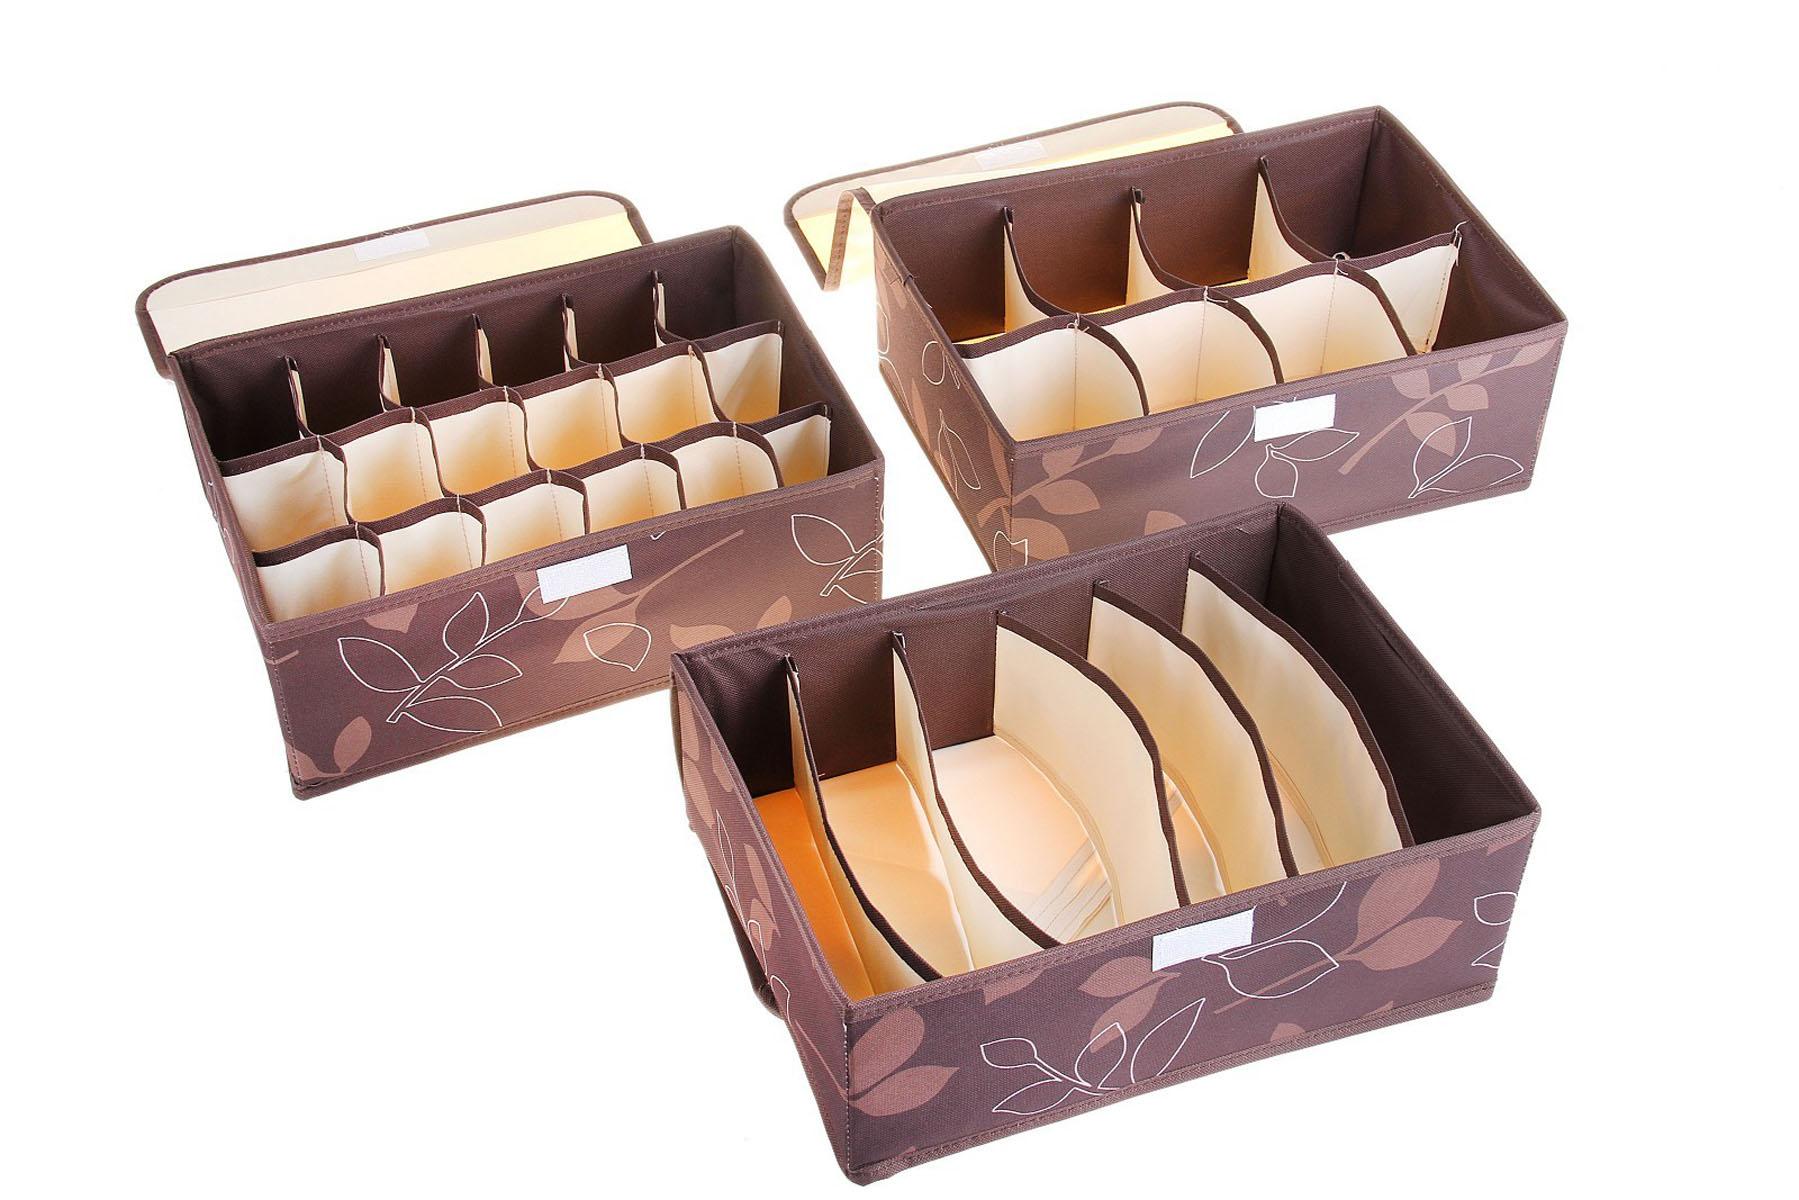 Кофр для мелких вещей Листочки, цвет: коричневый, 32 х 24 х 12 см, 3 шт760567